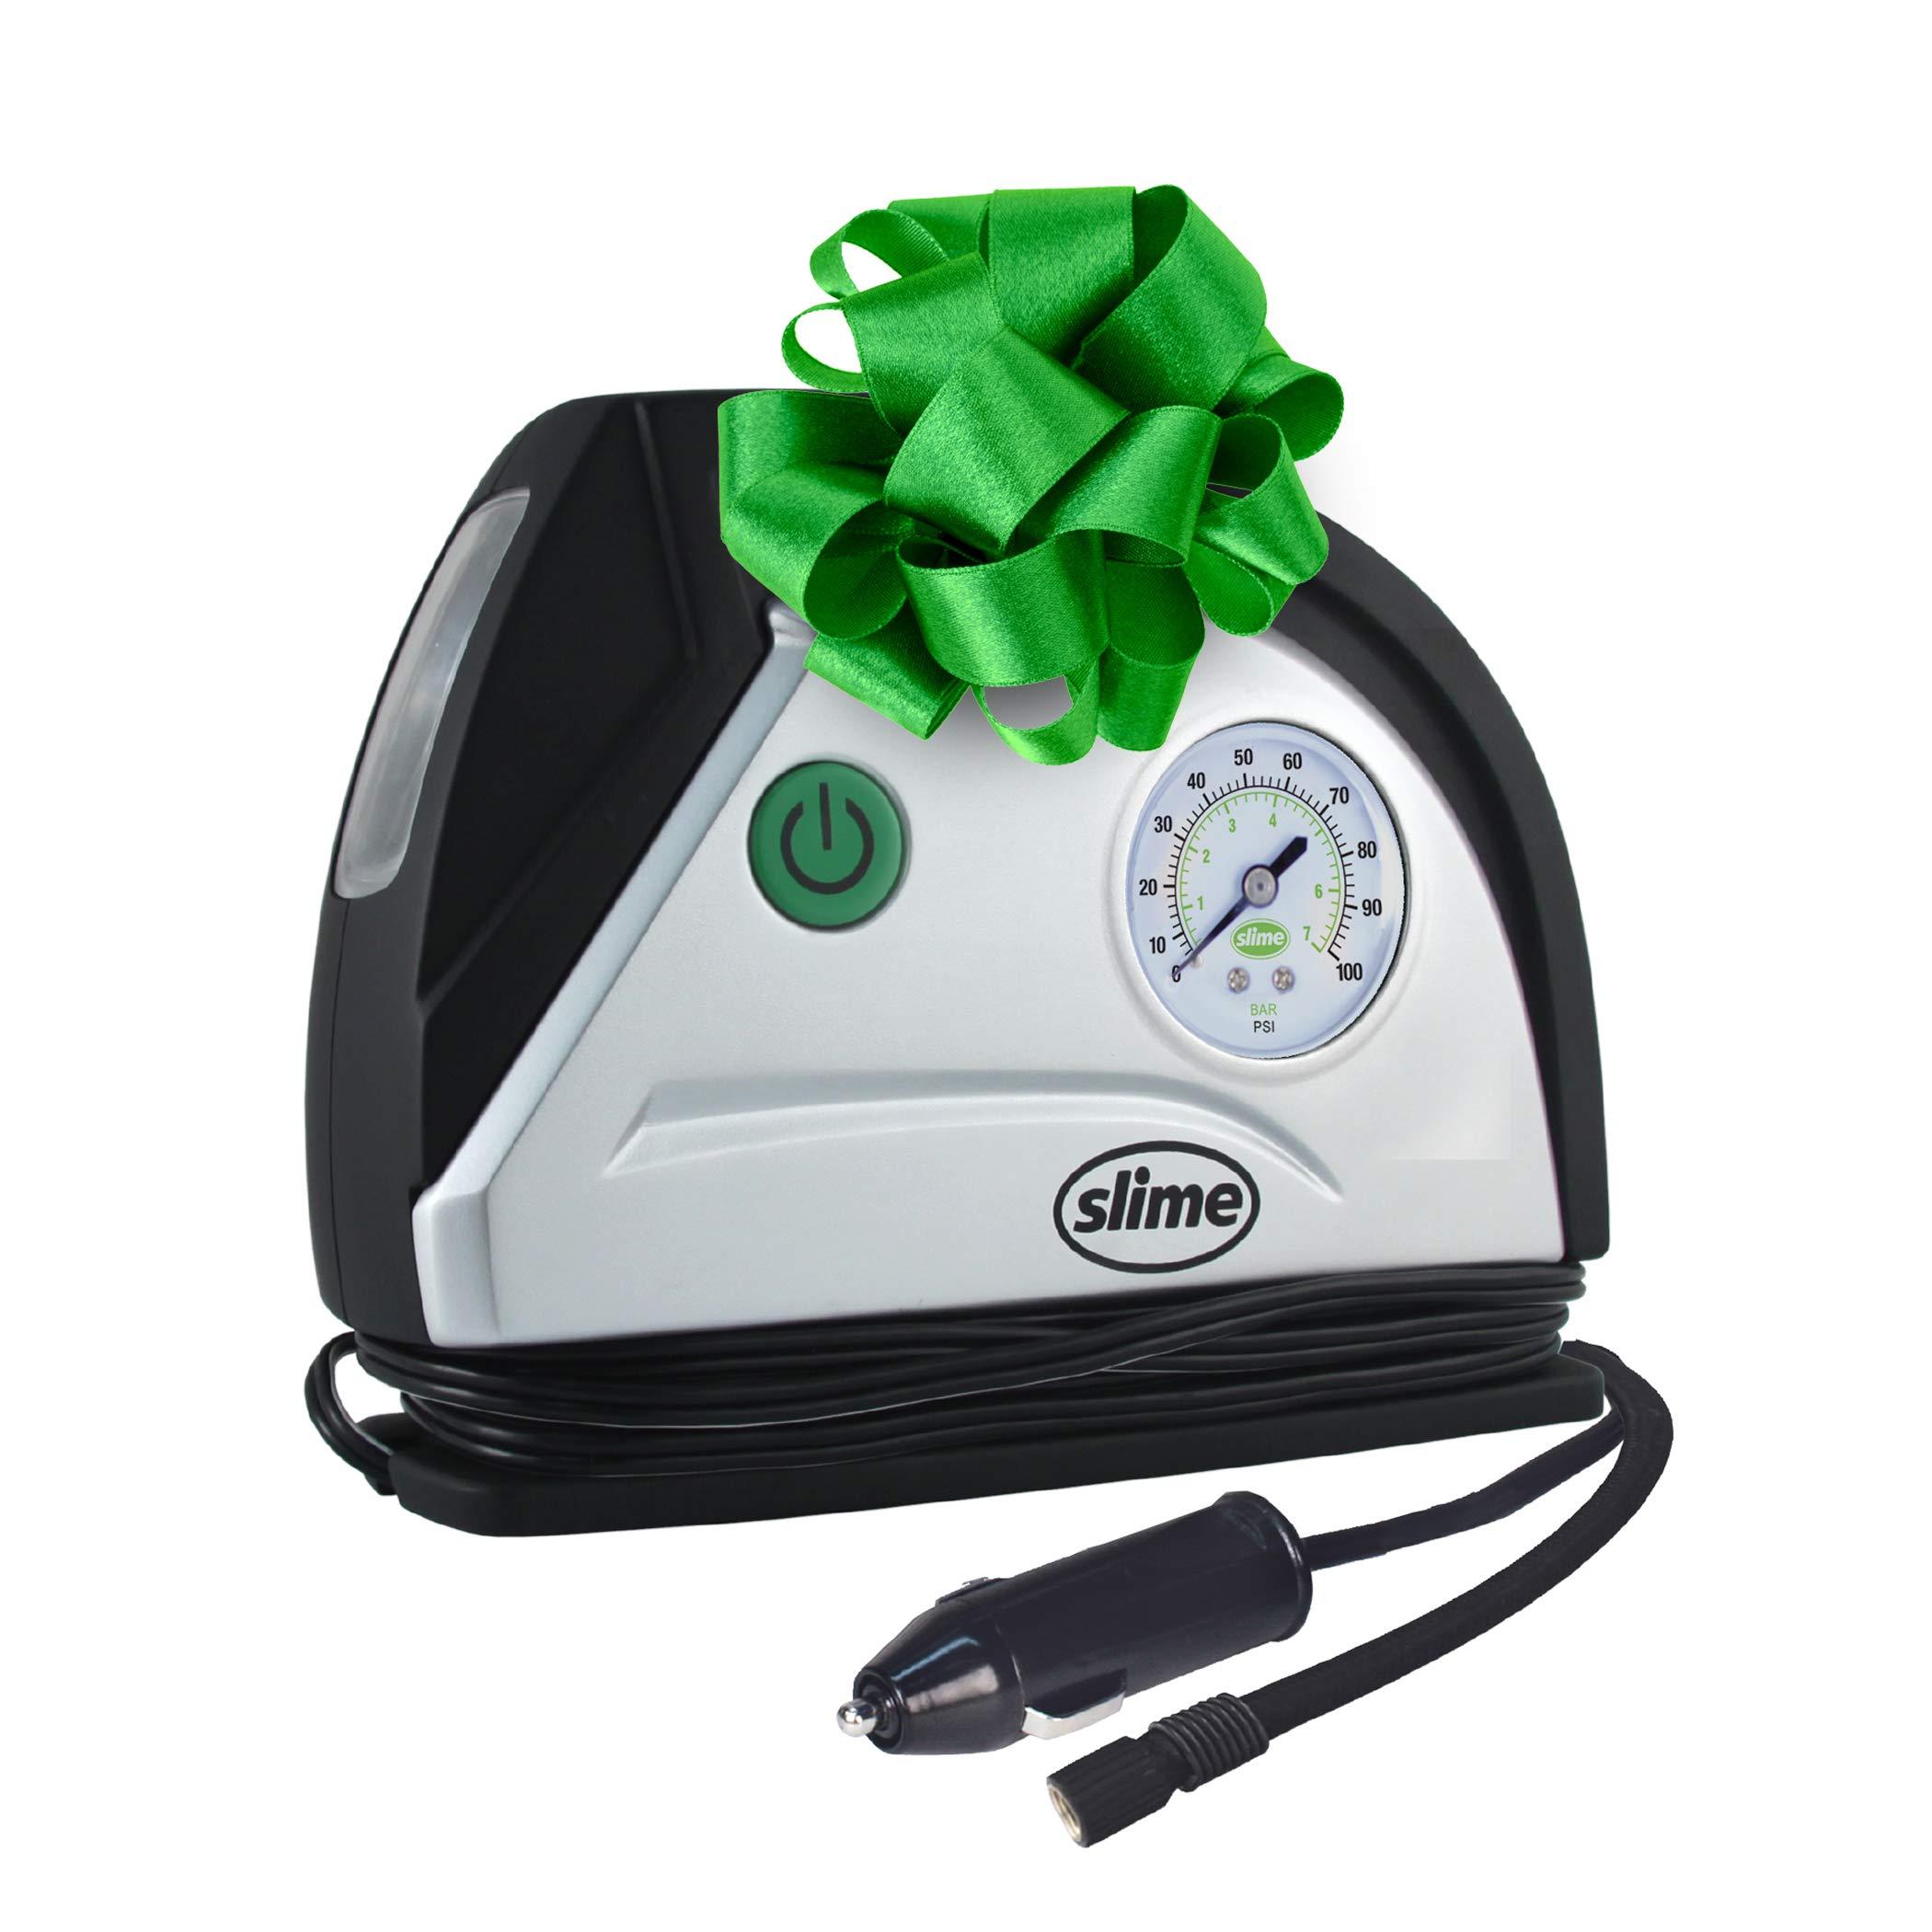 Slime 40050 Inflator Portable Compressor